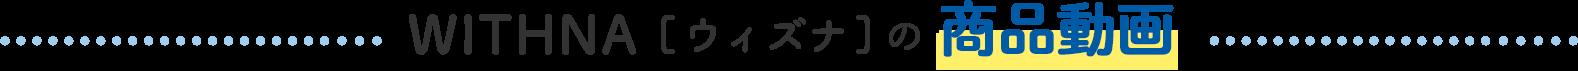 WITHNA [ウィズナ]の商品動画